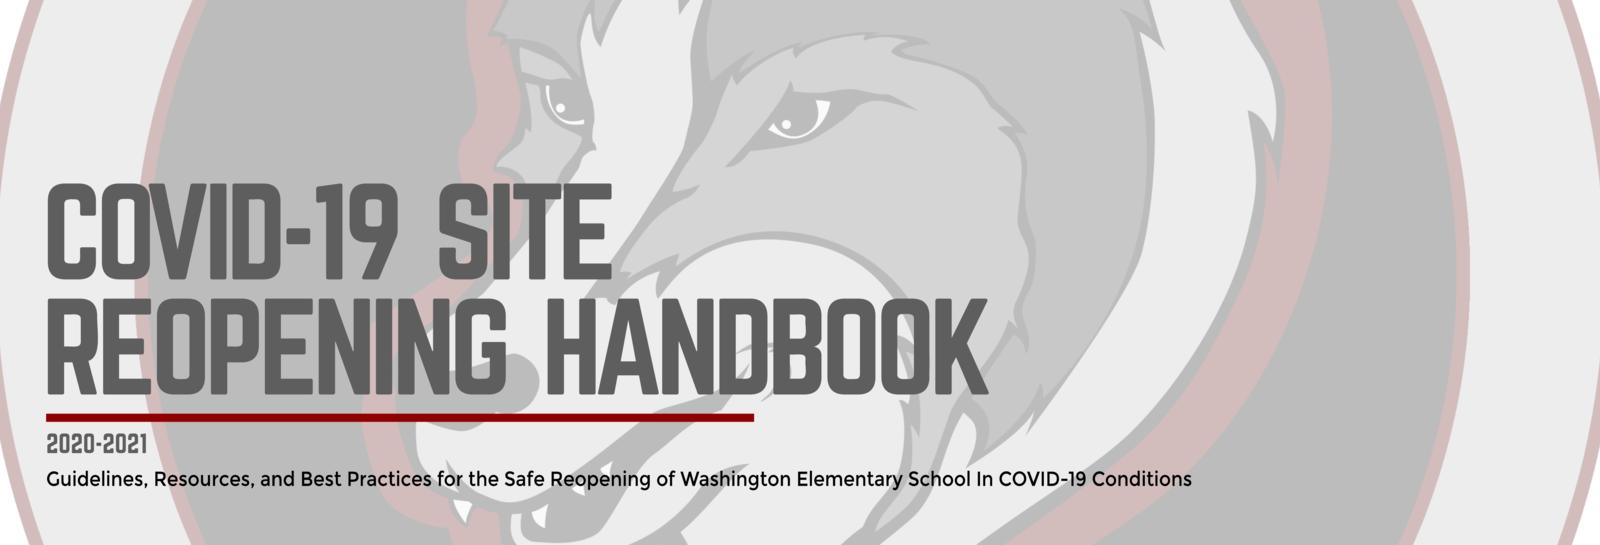 COVID-19 Site Reopening Handbook 2020-2021